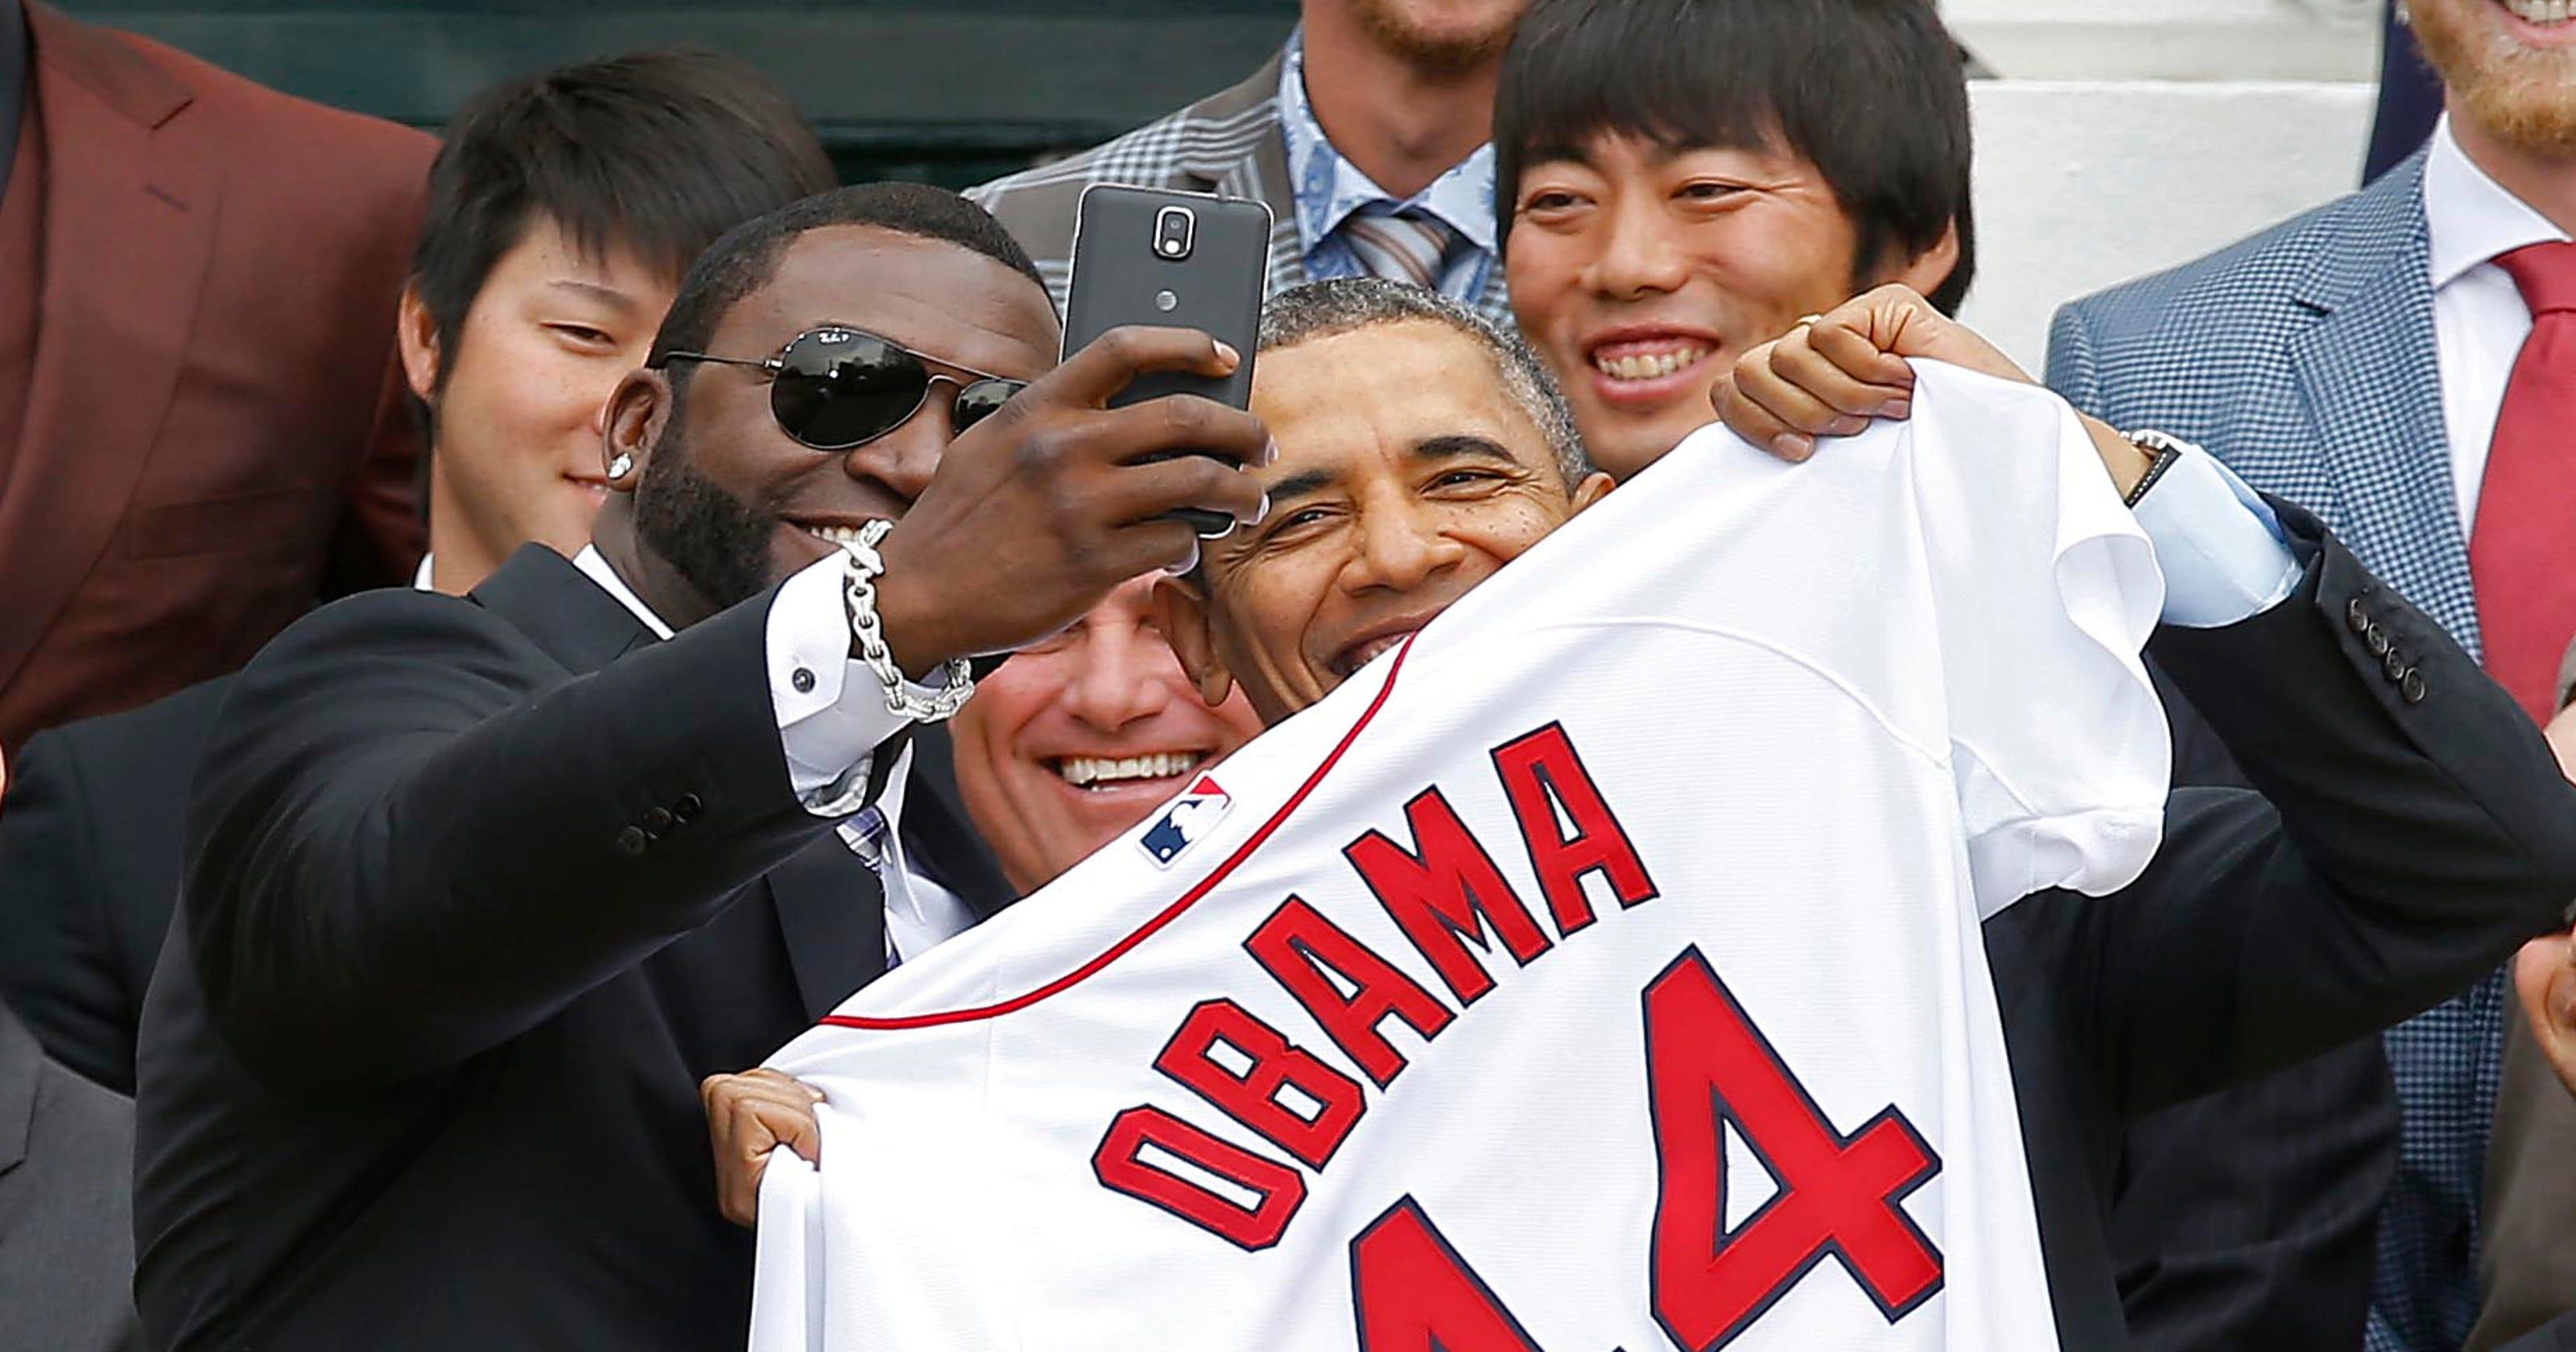 545e3c15170 David Ortiz claims selfie with Obama was organic